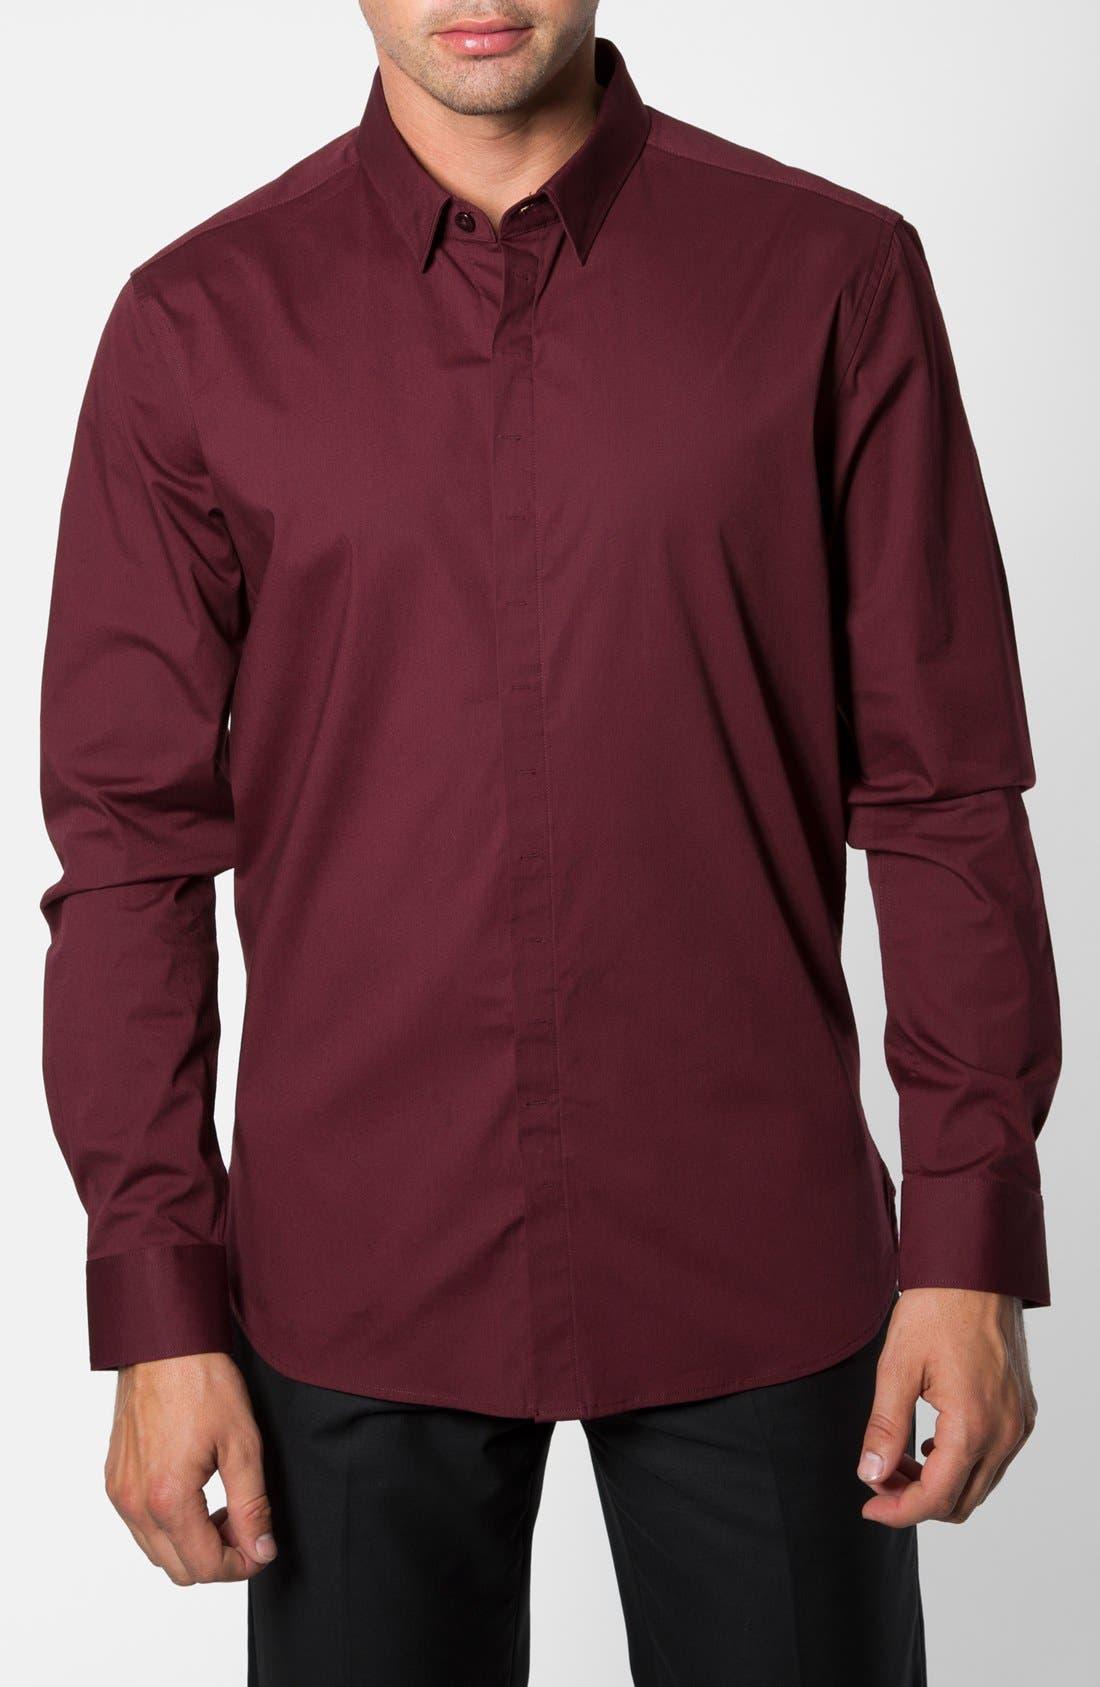 'Peace Train' Trim Fit Woven Shirt,                         Main,                         color, Maroon